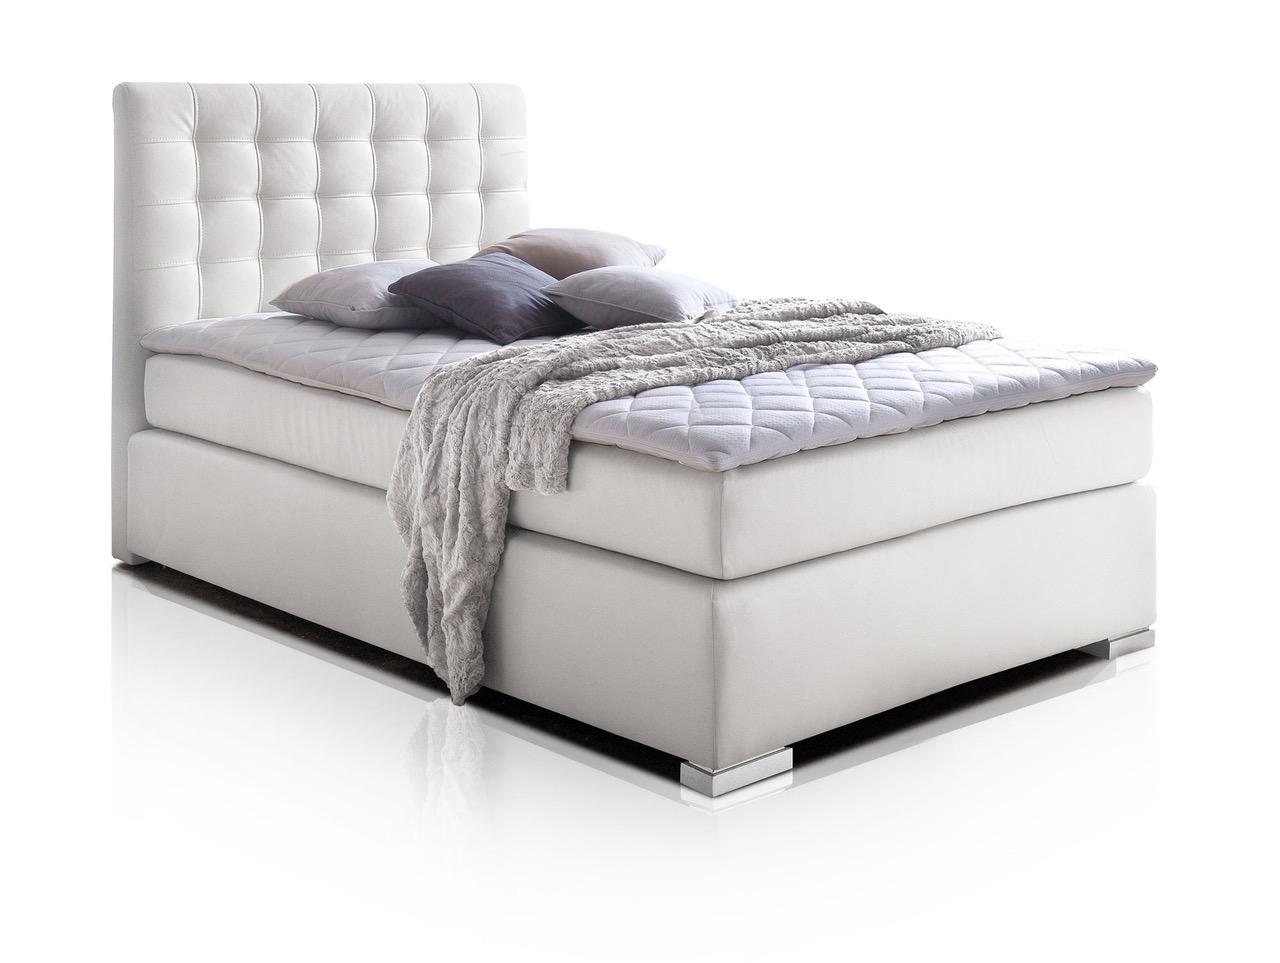 isabell plus boxspringbett 90 x 200 cm weiss h rtegrad 2. Black Bedroom Furniture Sets. Home Design Ideas